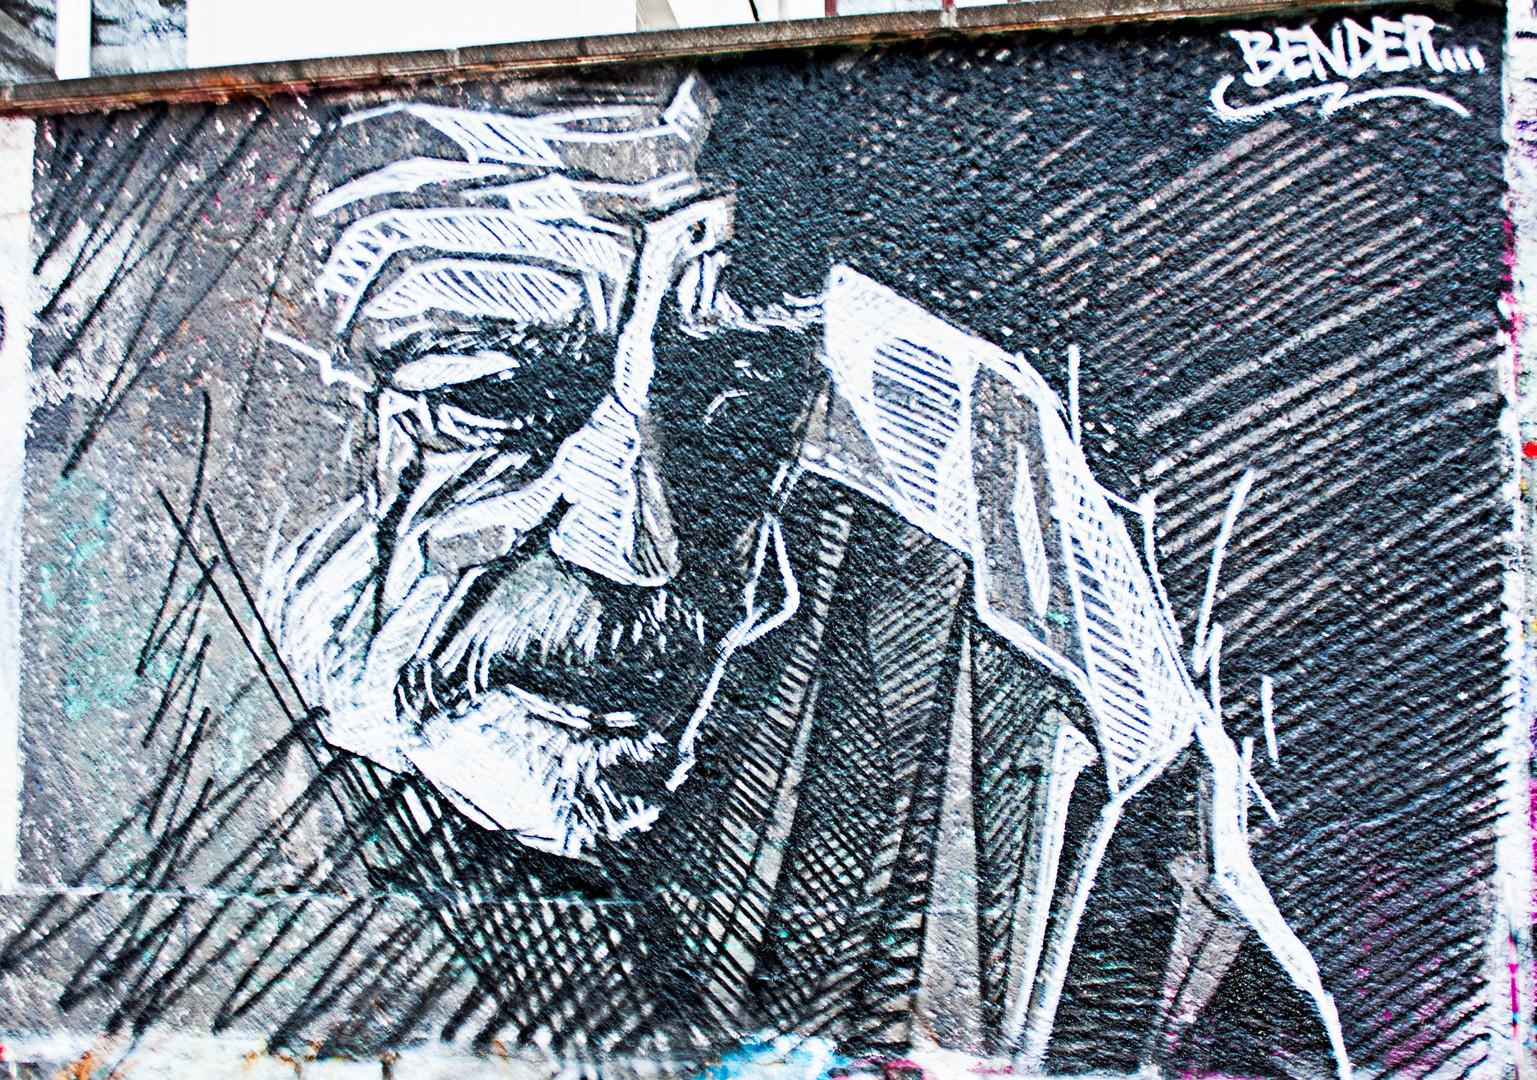 Meistergraffiti